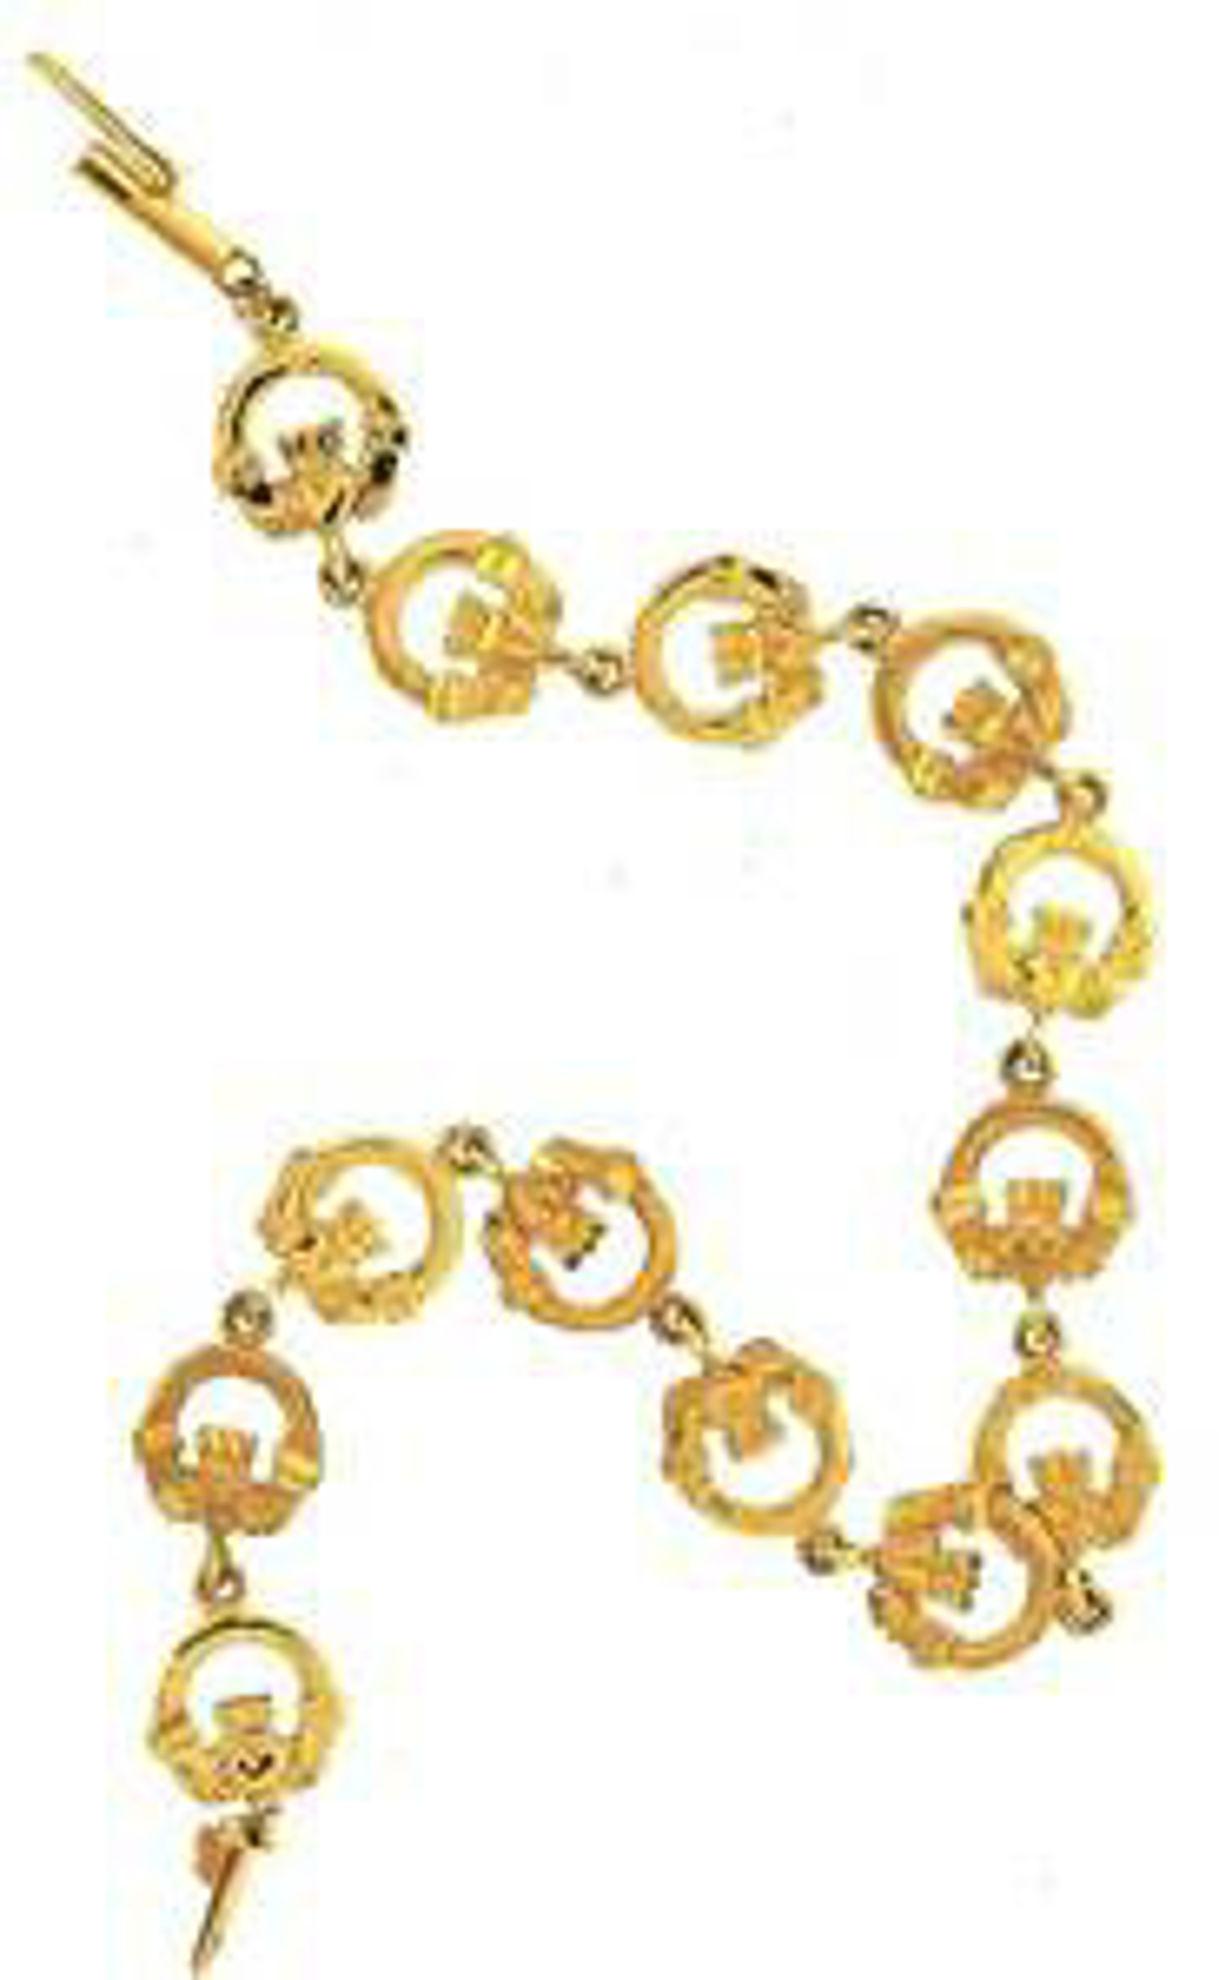 Picture of Bracelets 14kt-3.4 DWT, 5.3 Grams